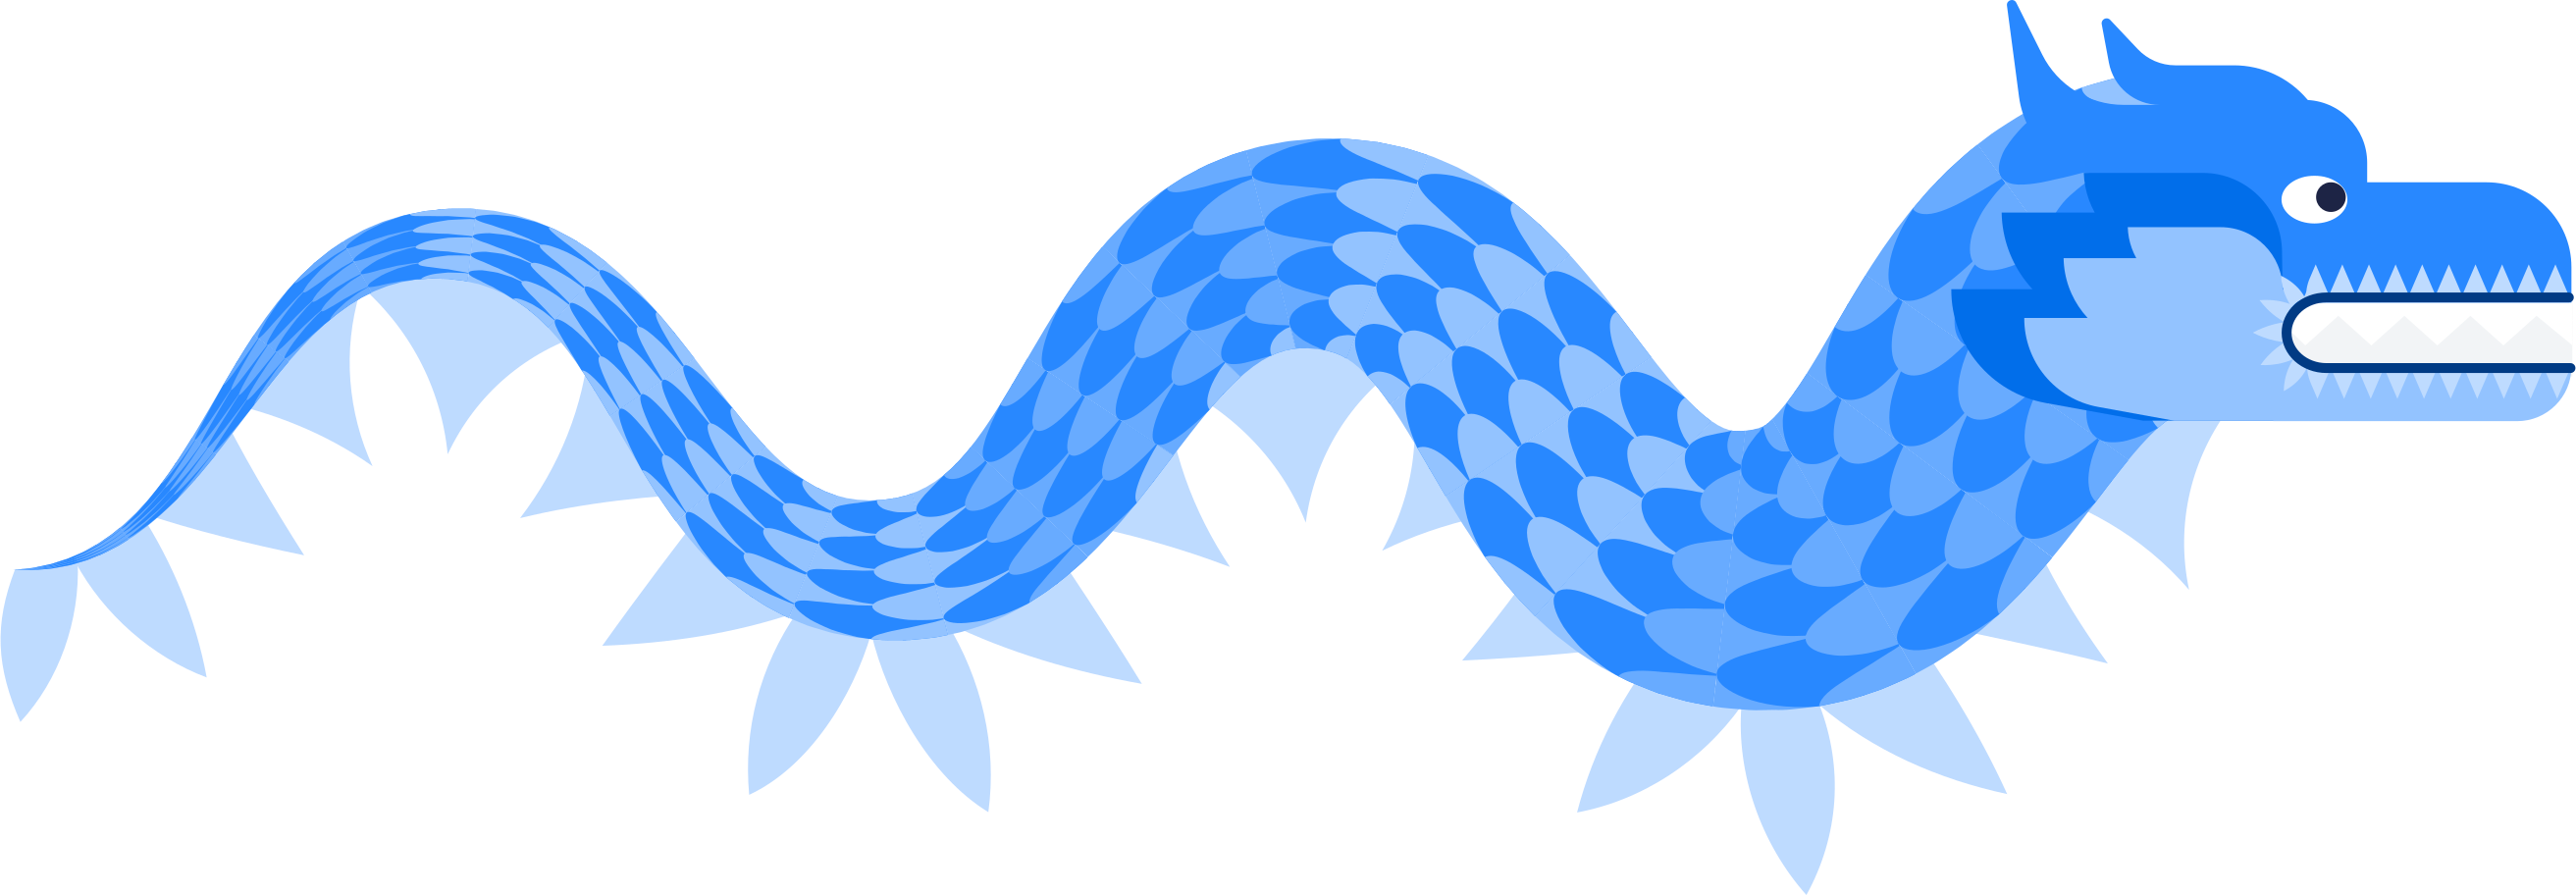 dragon paper Clipart illustration in PNG, SVG